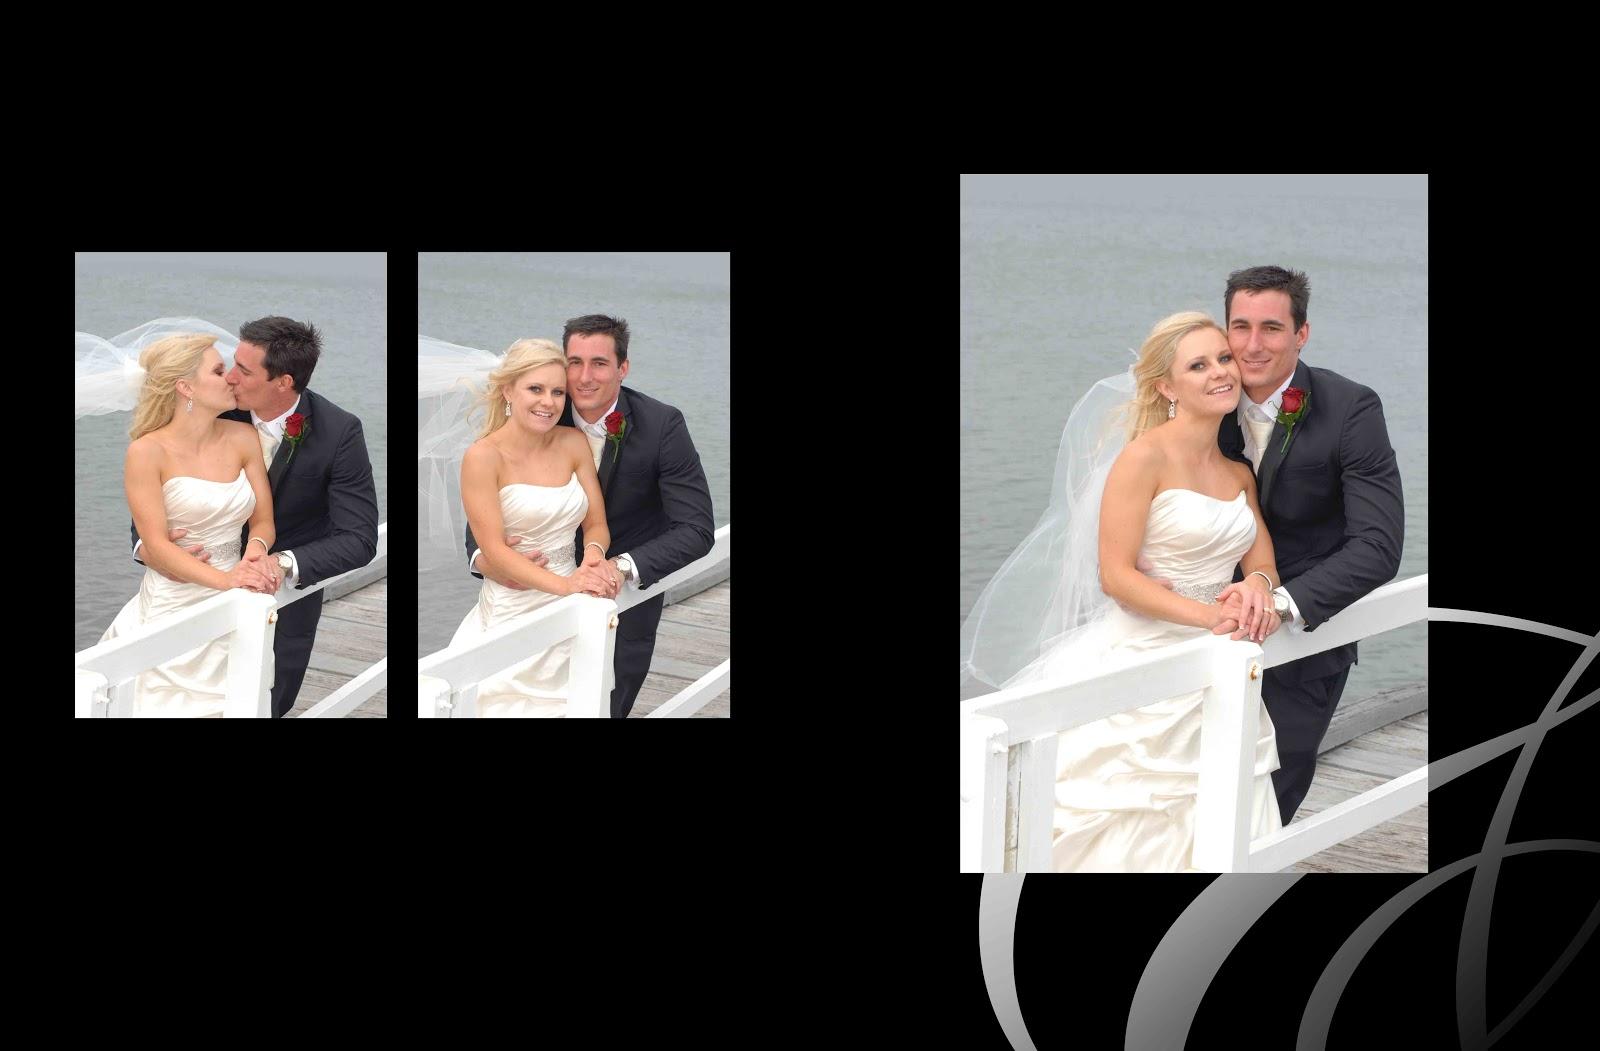 Digital creative projects amy and david 39 s wedding album for Wedding album design